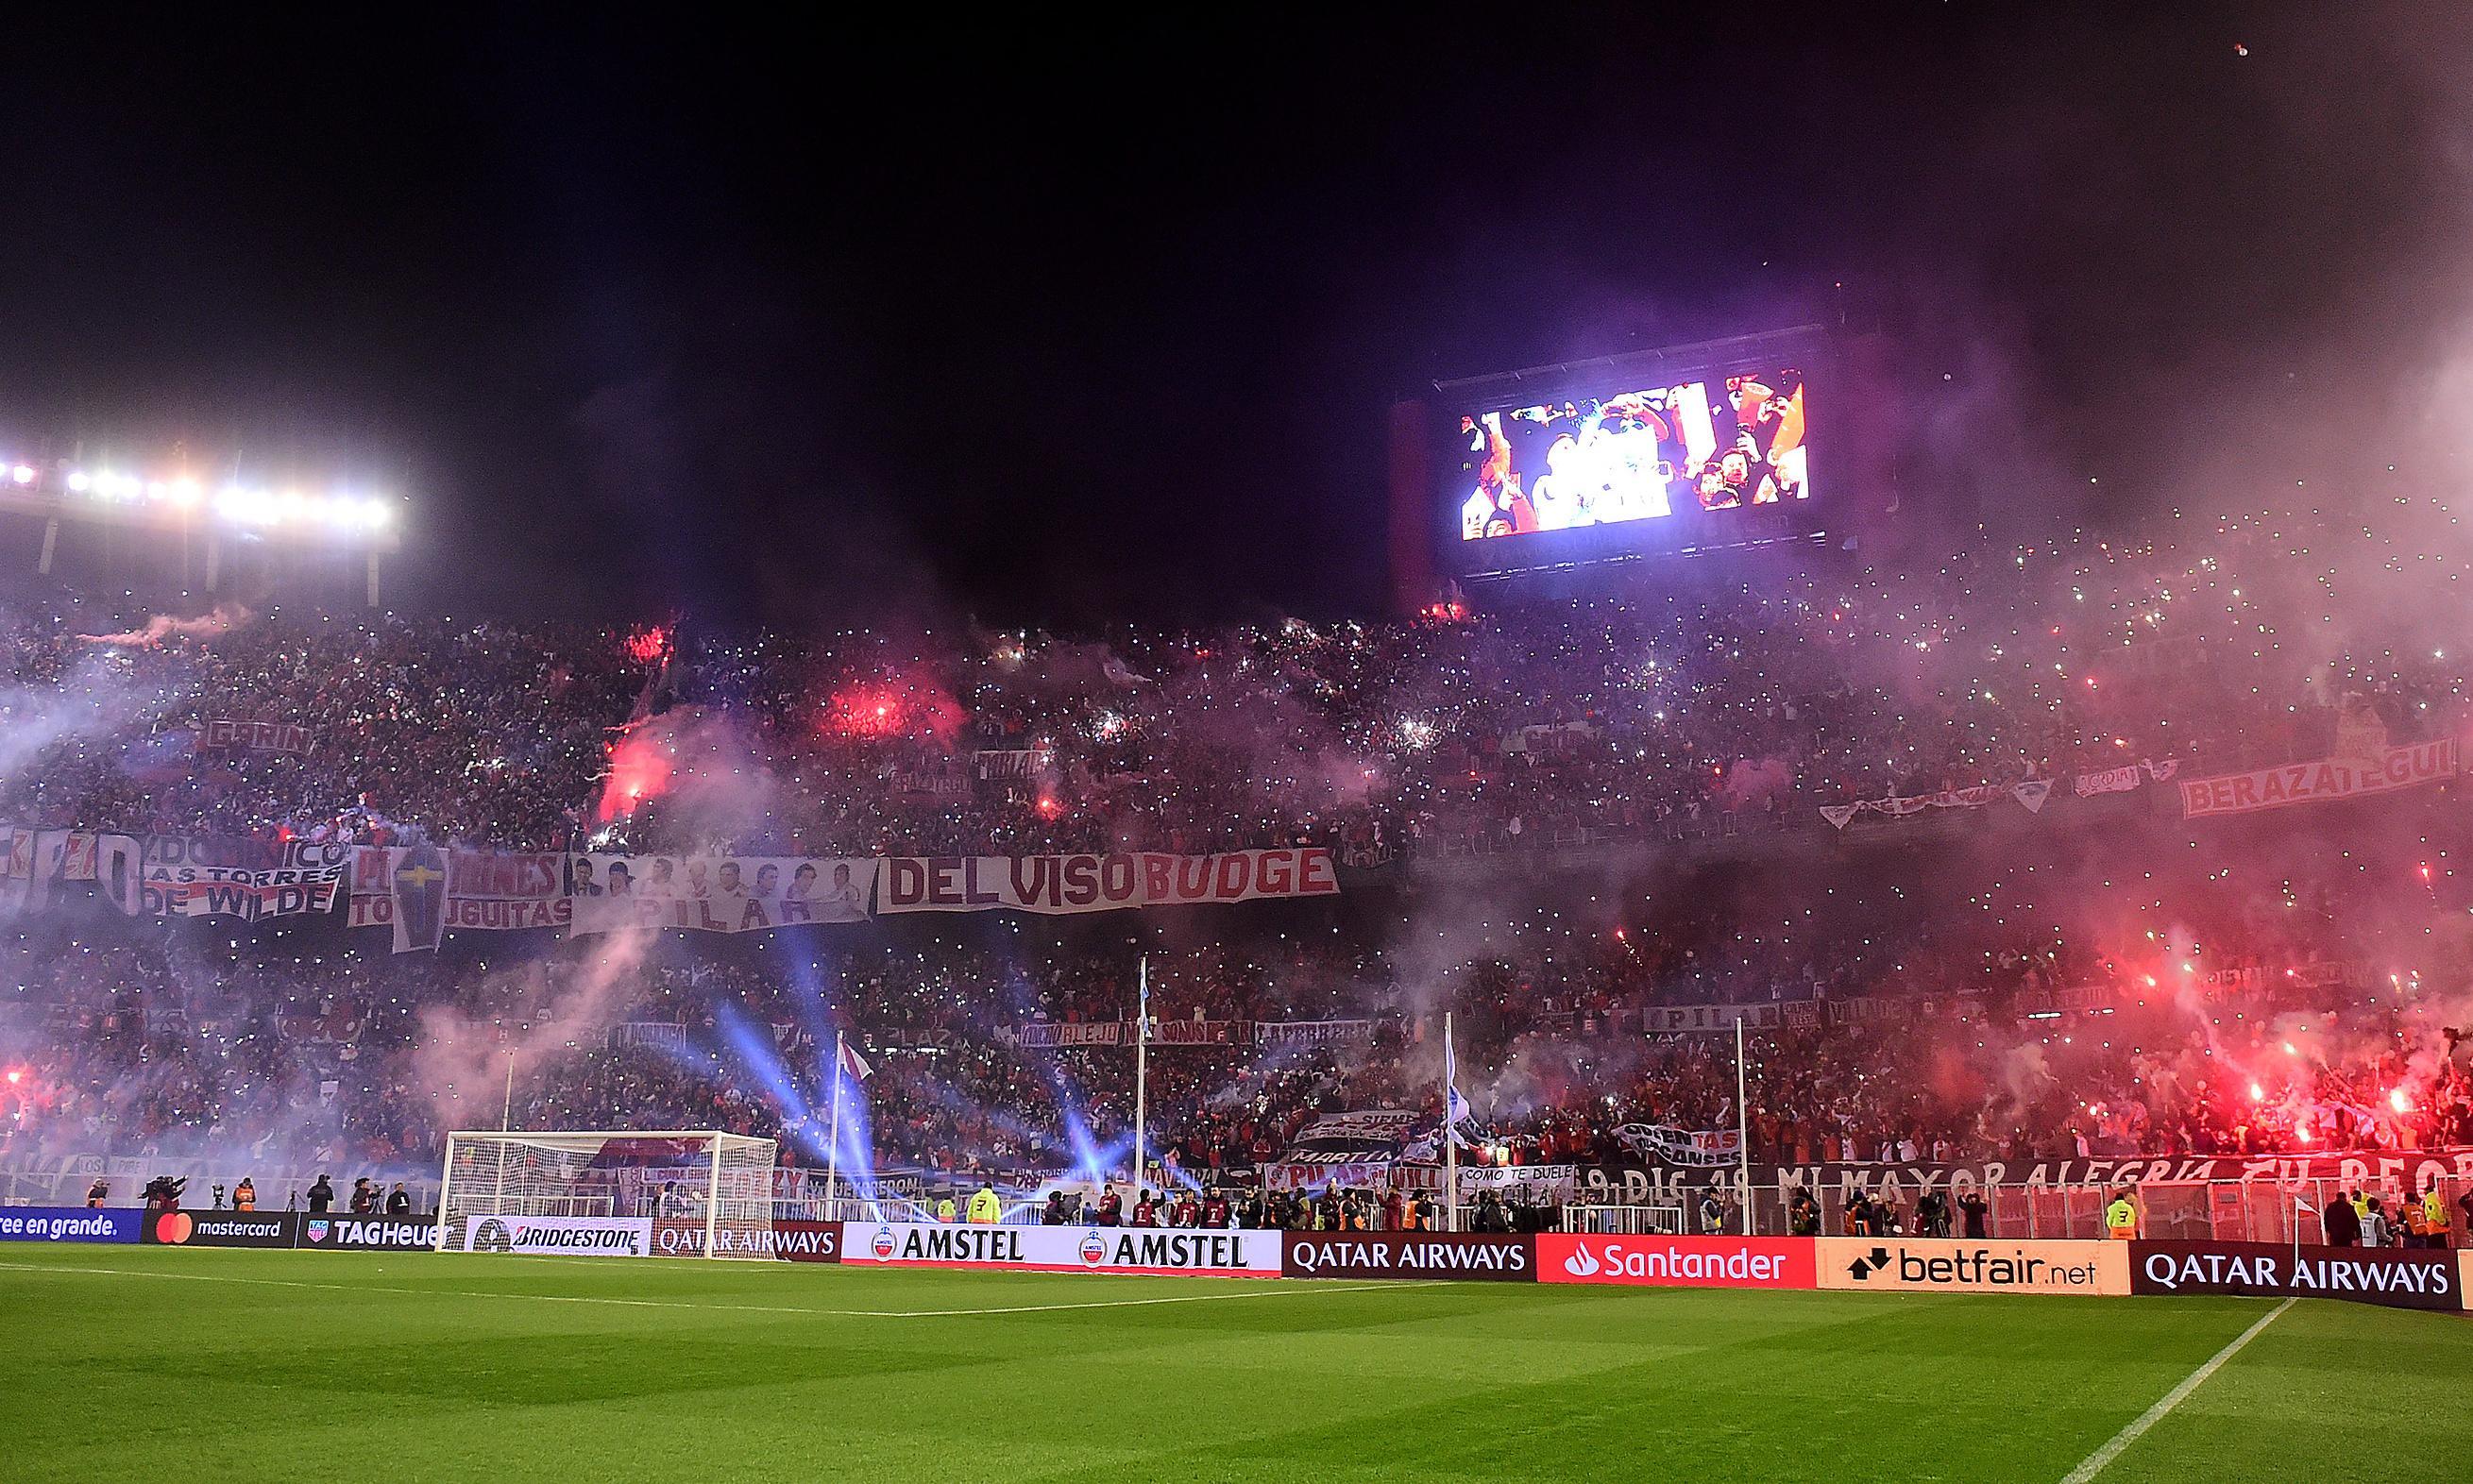 Conspiracy theories cast shadow over River Plate v Boca Juniors reunion